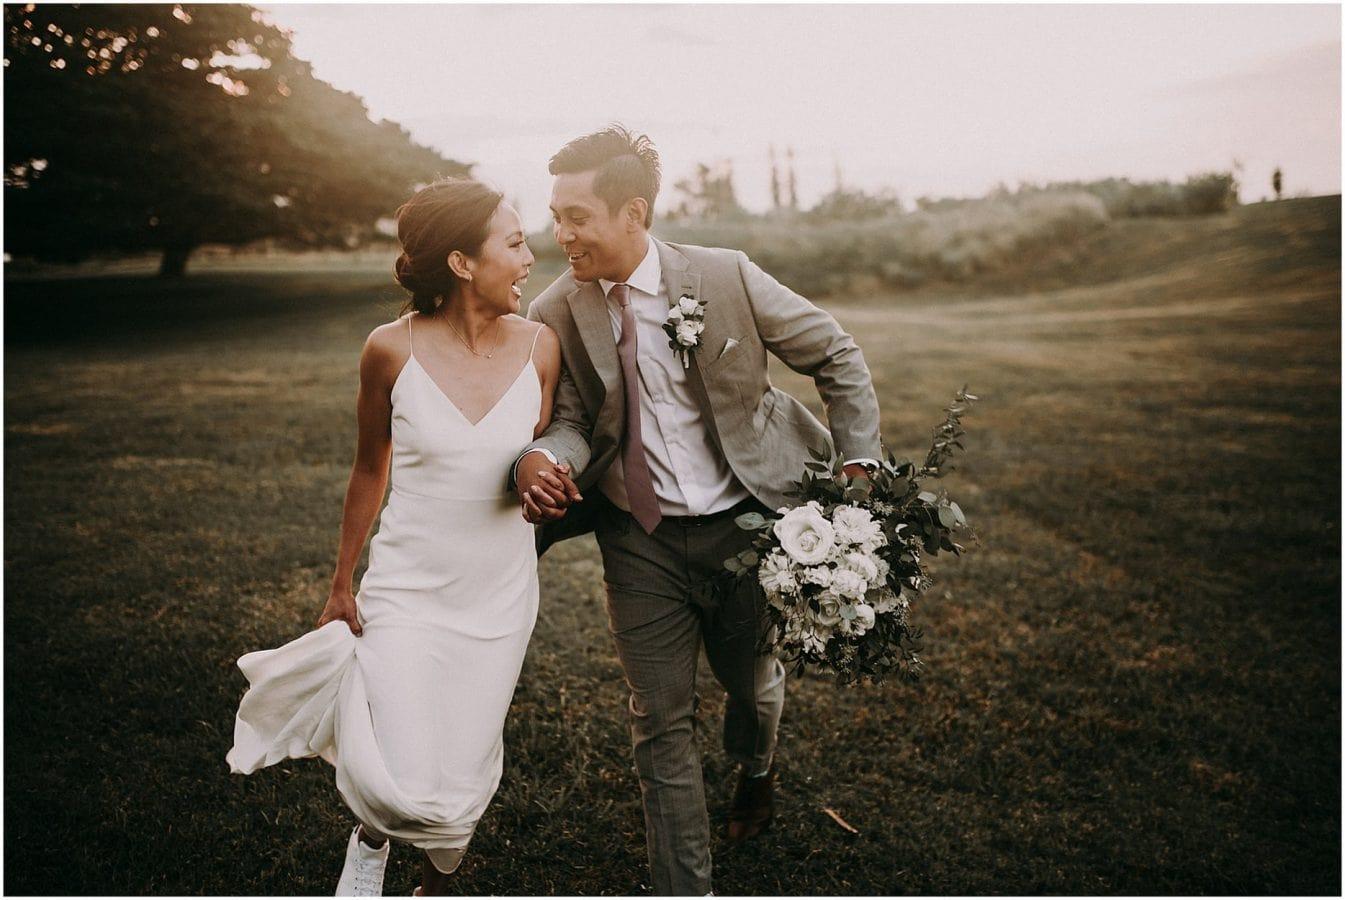 Maui wedding photography52